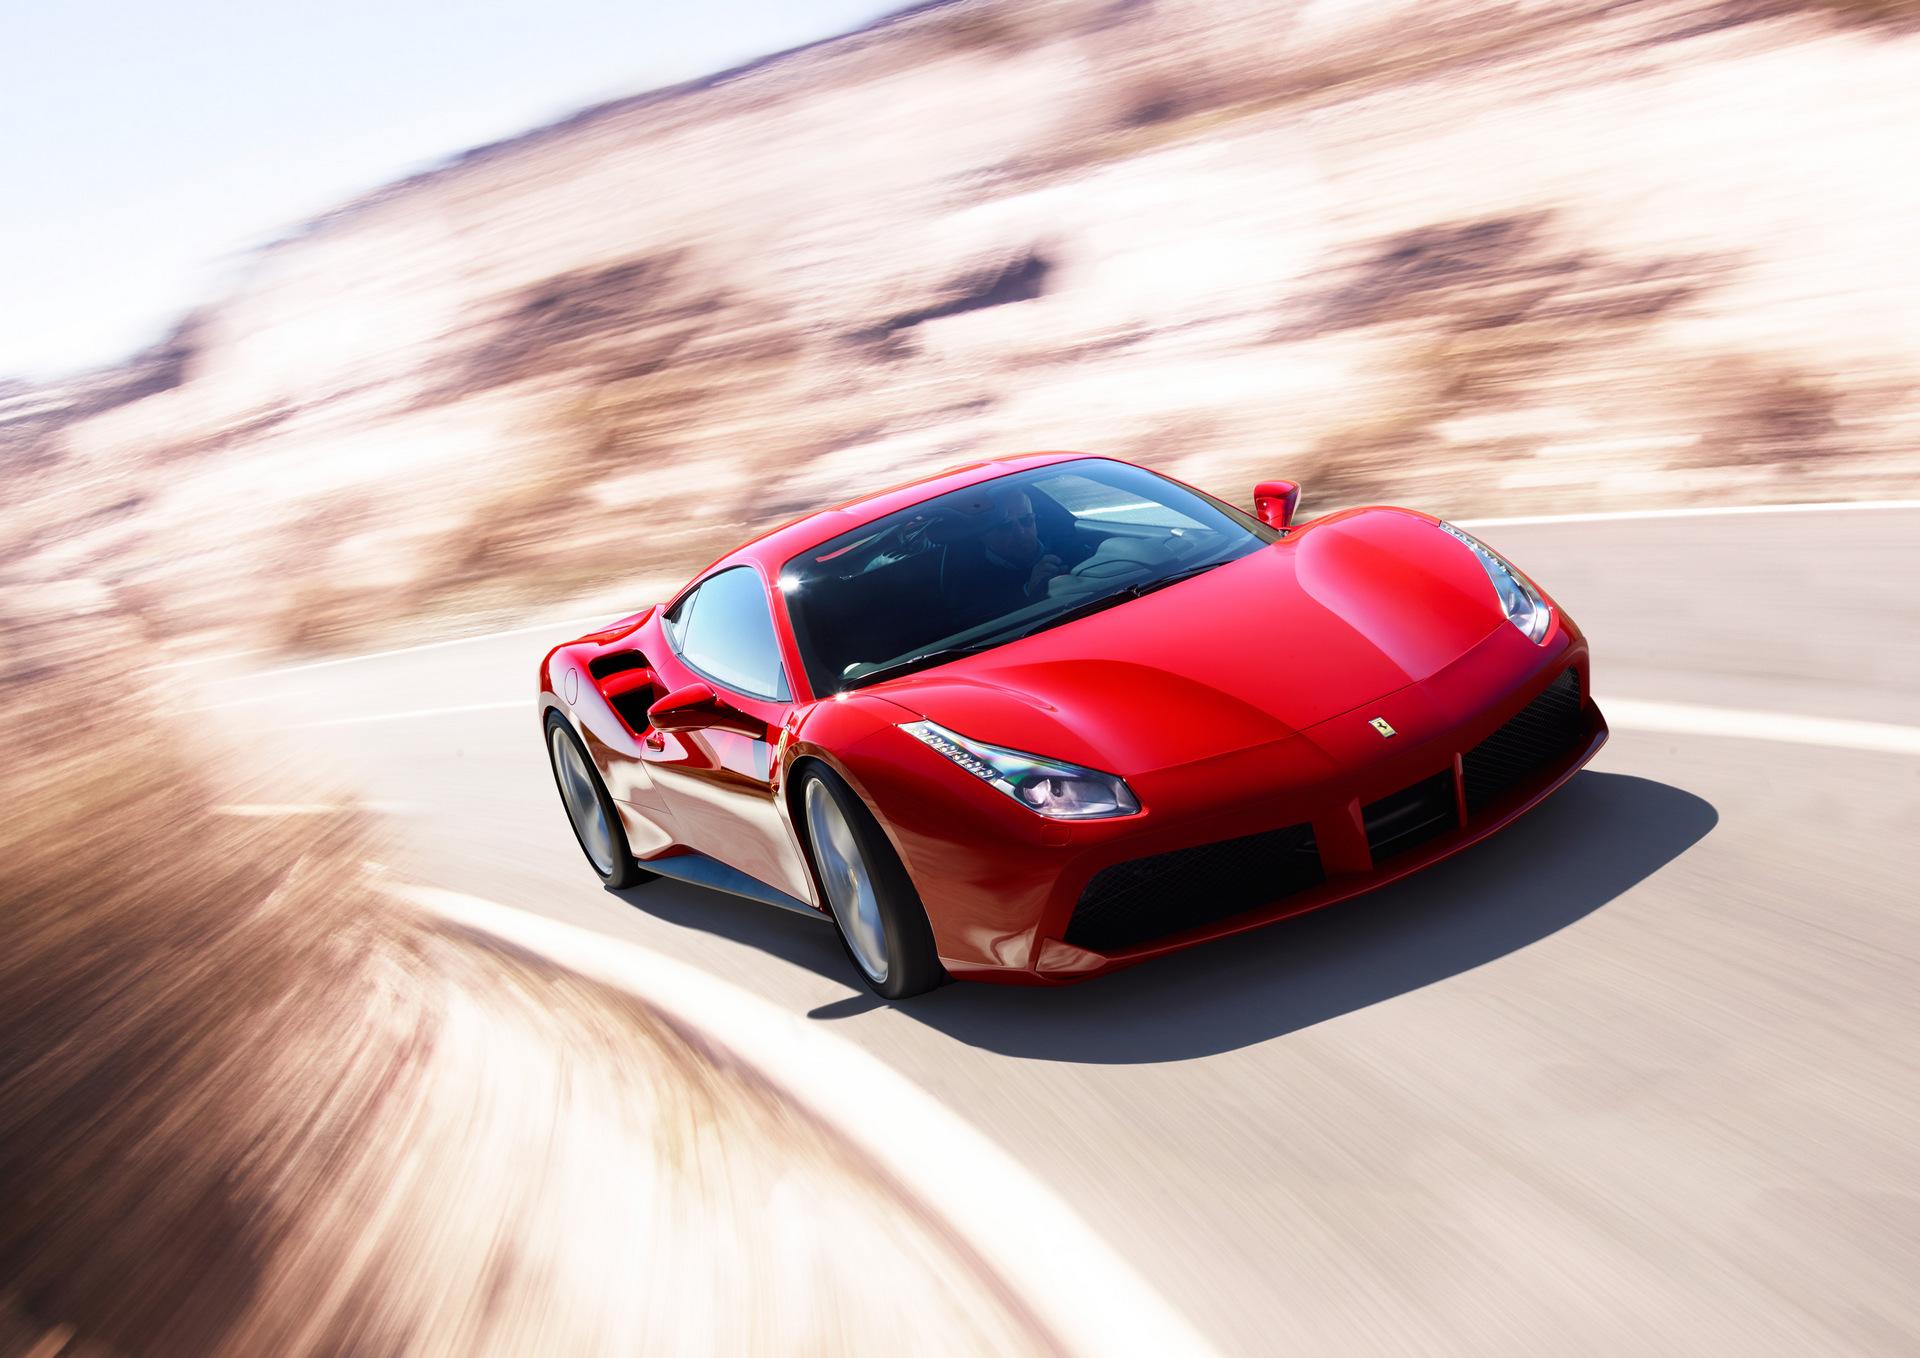 Ferrari 488GTB © Ferrari S.p.A.